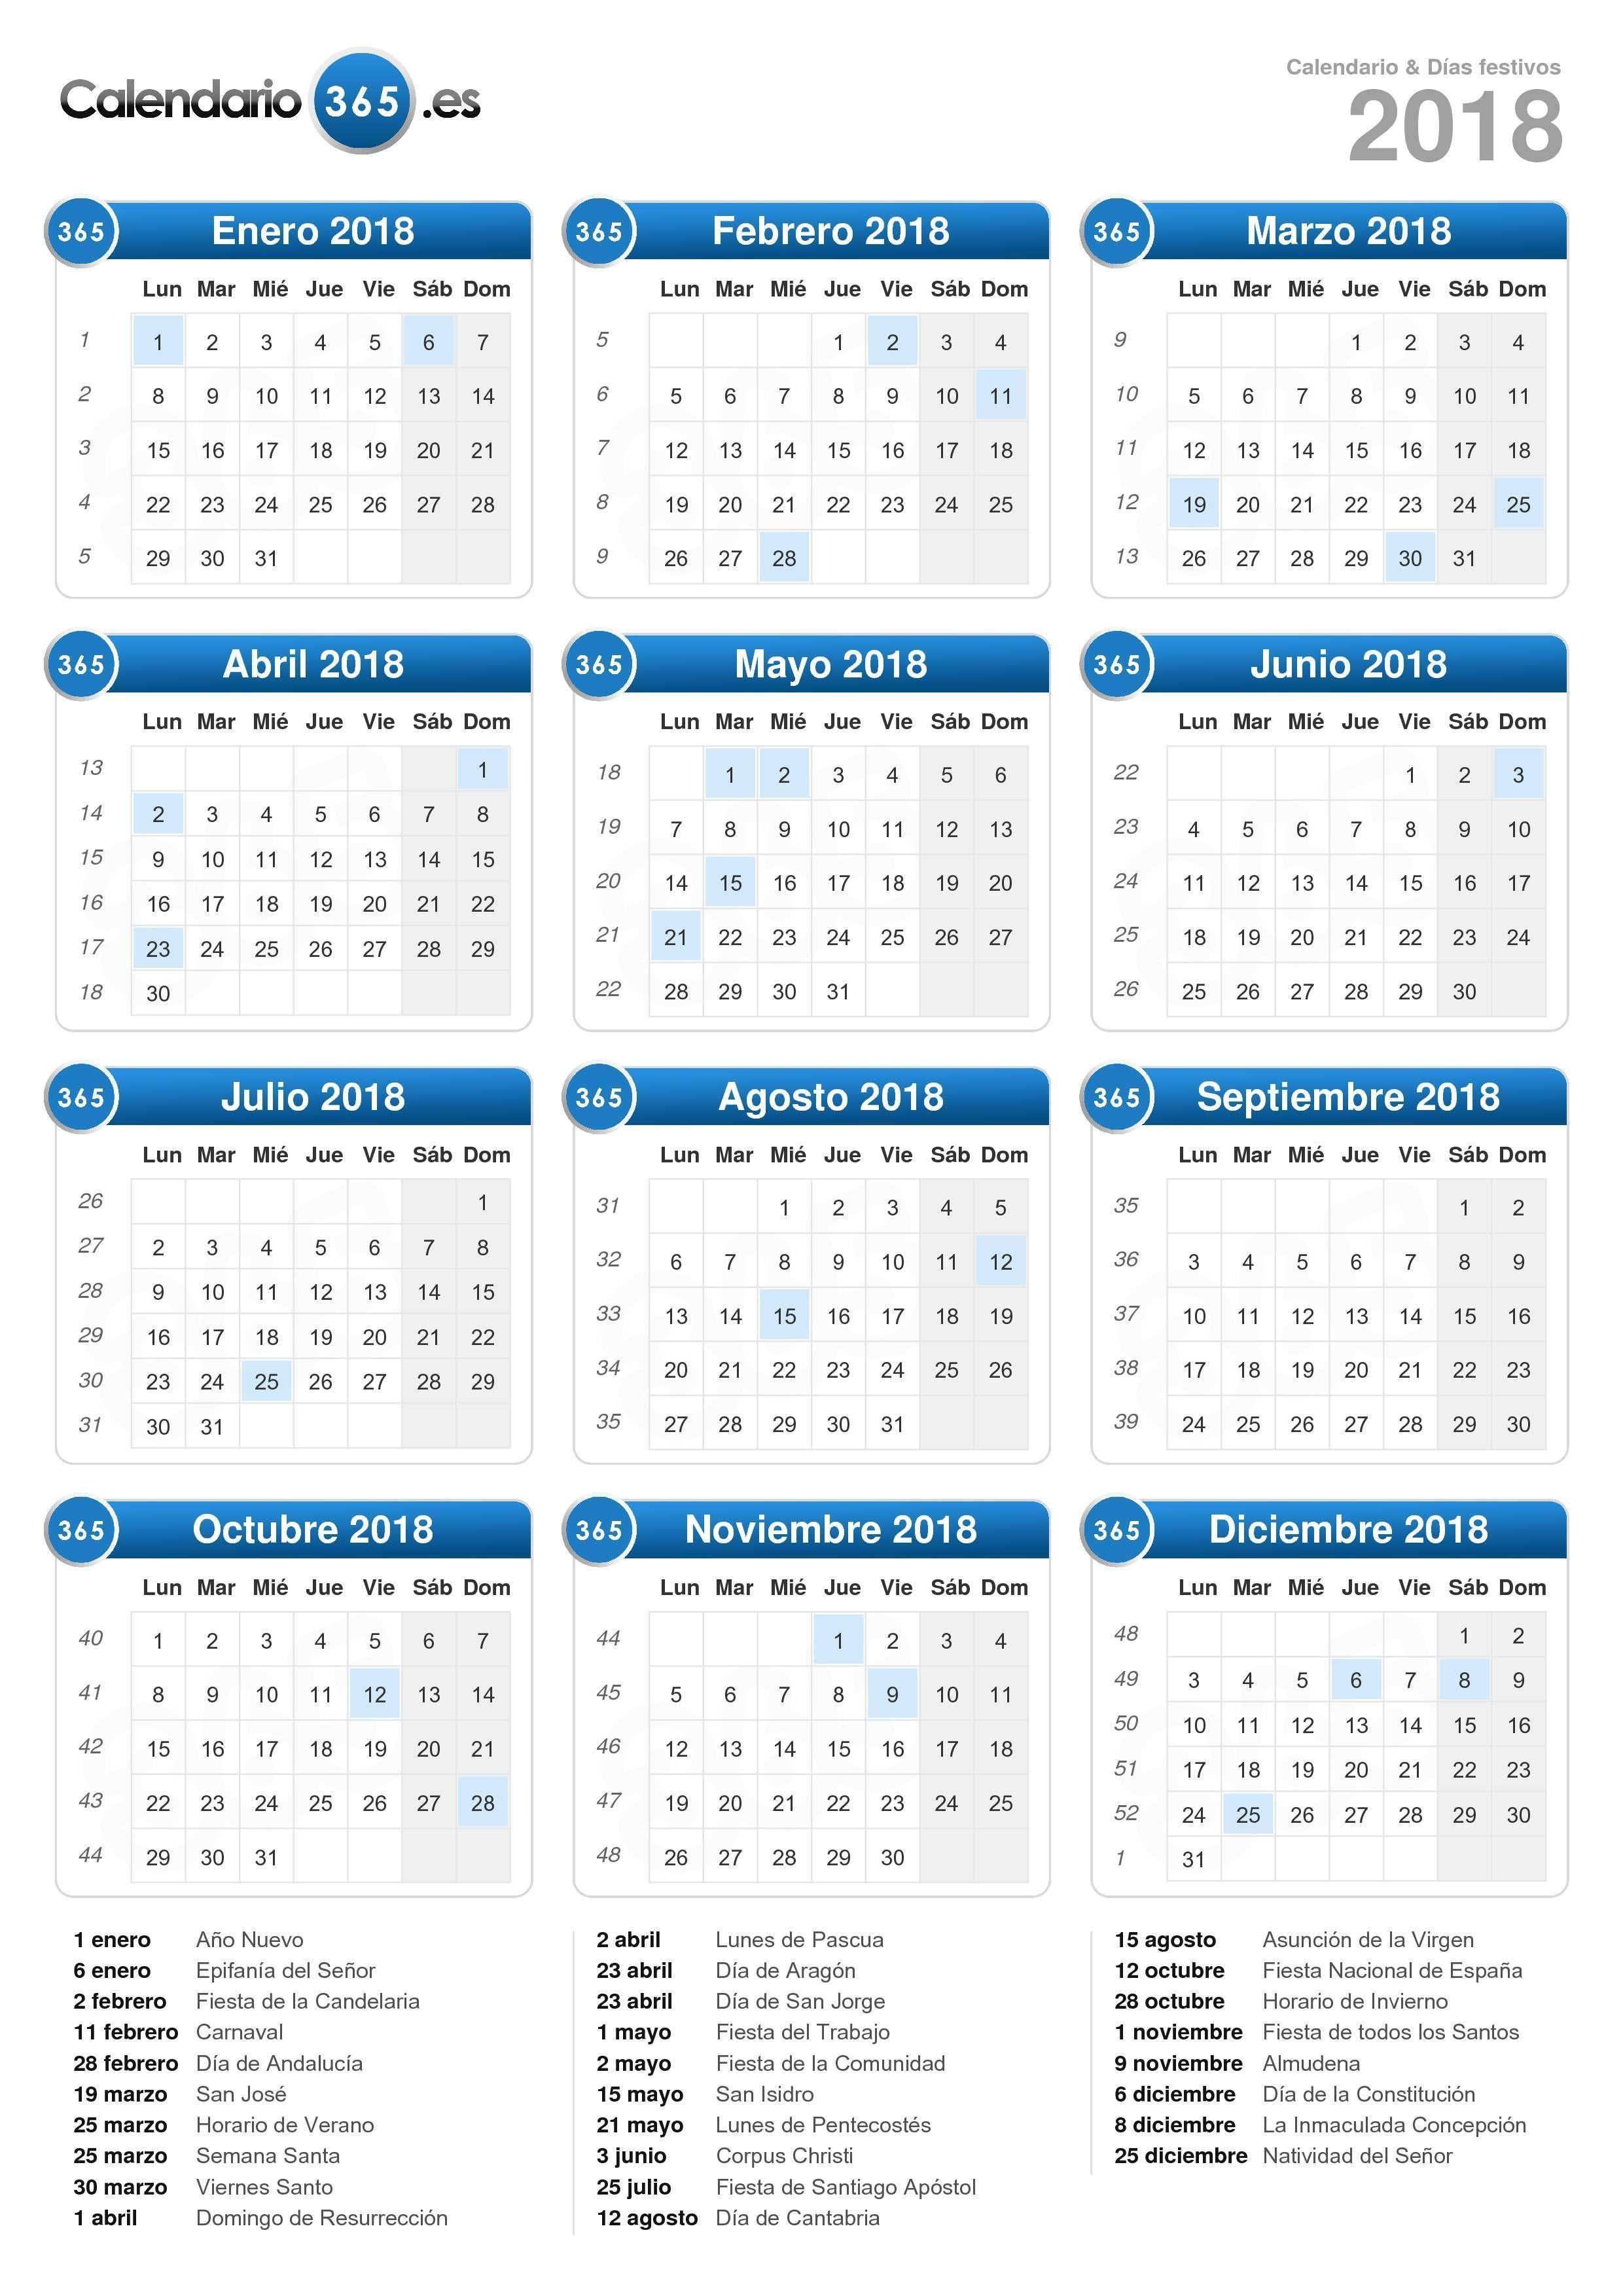 Calendario 2019 Con Festivos Para Imprimir Más Arriba-a-fecha Calendario 2018 formato Vertical Calendarios Of Calendario 2019 Con Festivos Para Imprimir Más Recientemente Liberado Determinar Calendario 2019 In Excel